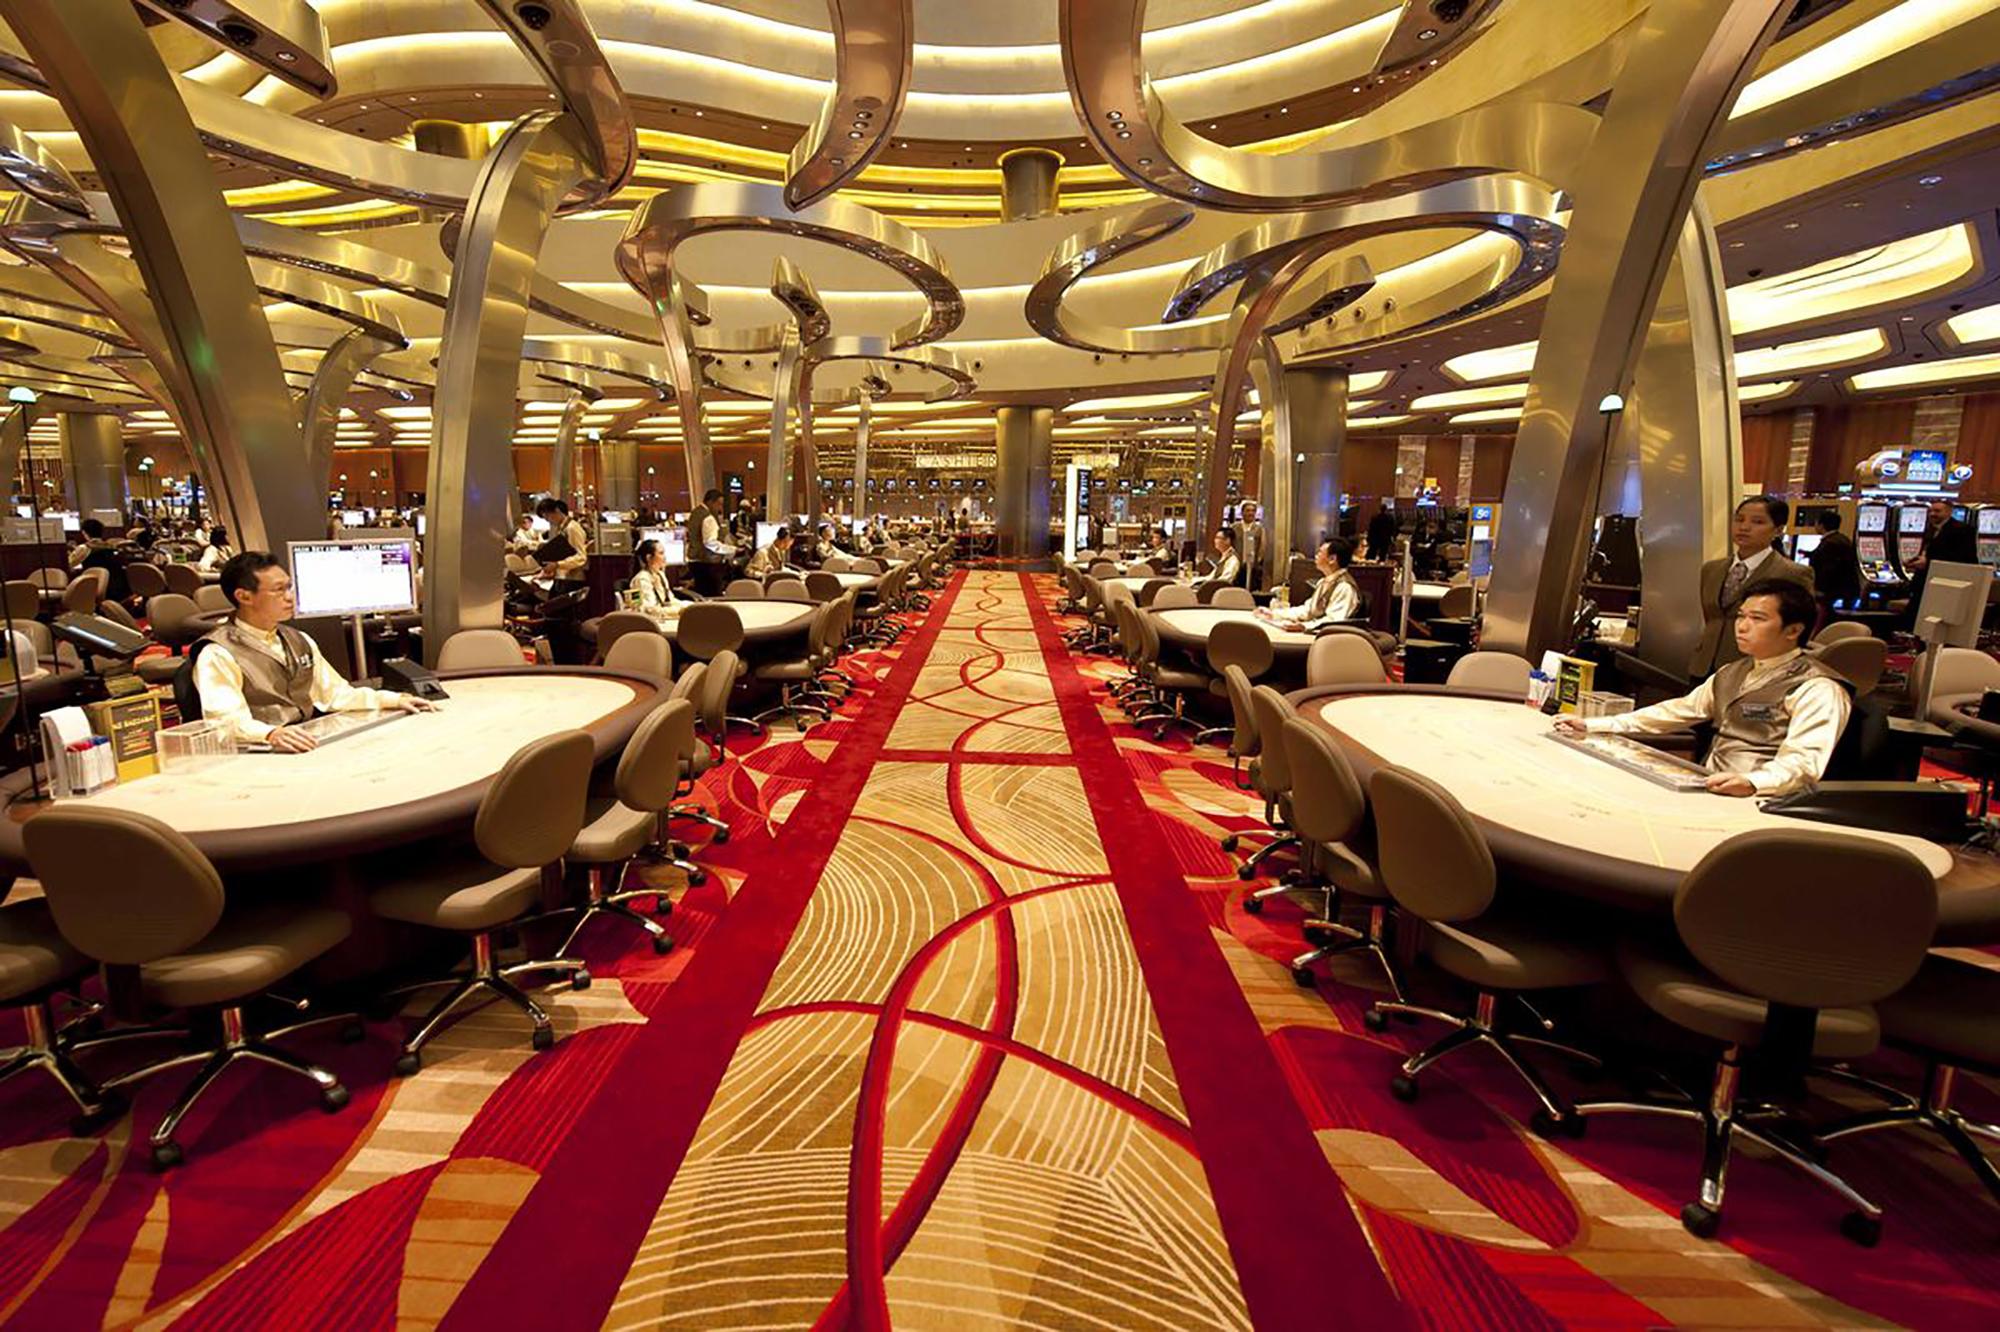 Casino at marina bay sands top casino companies by revenue